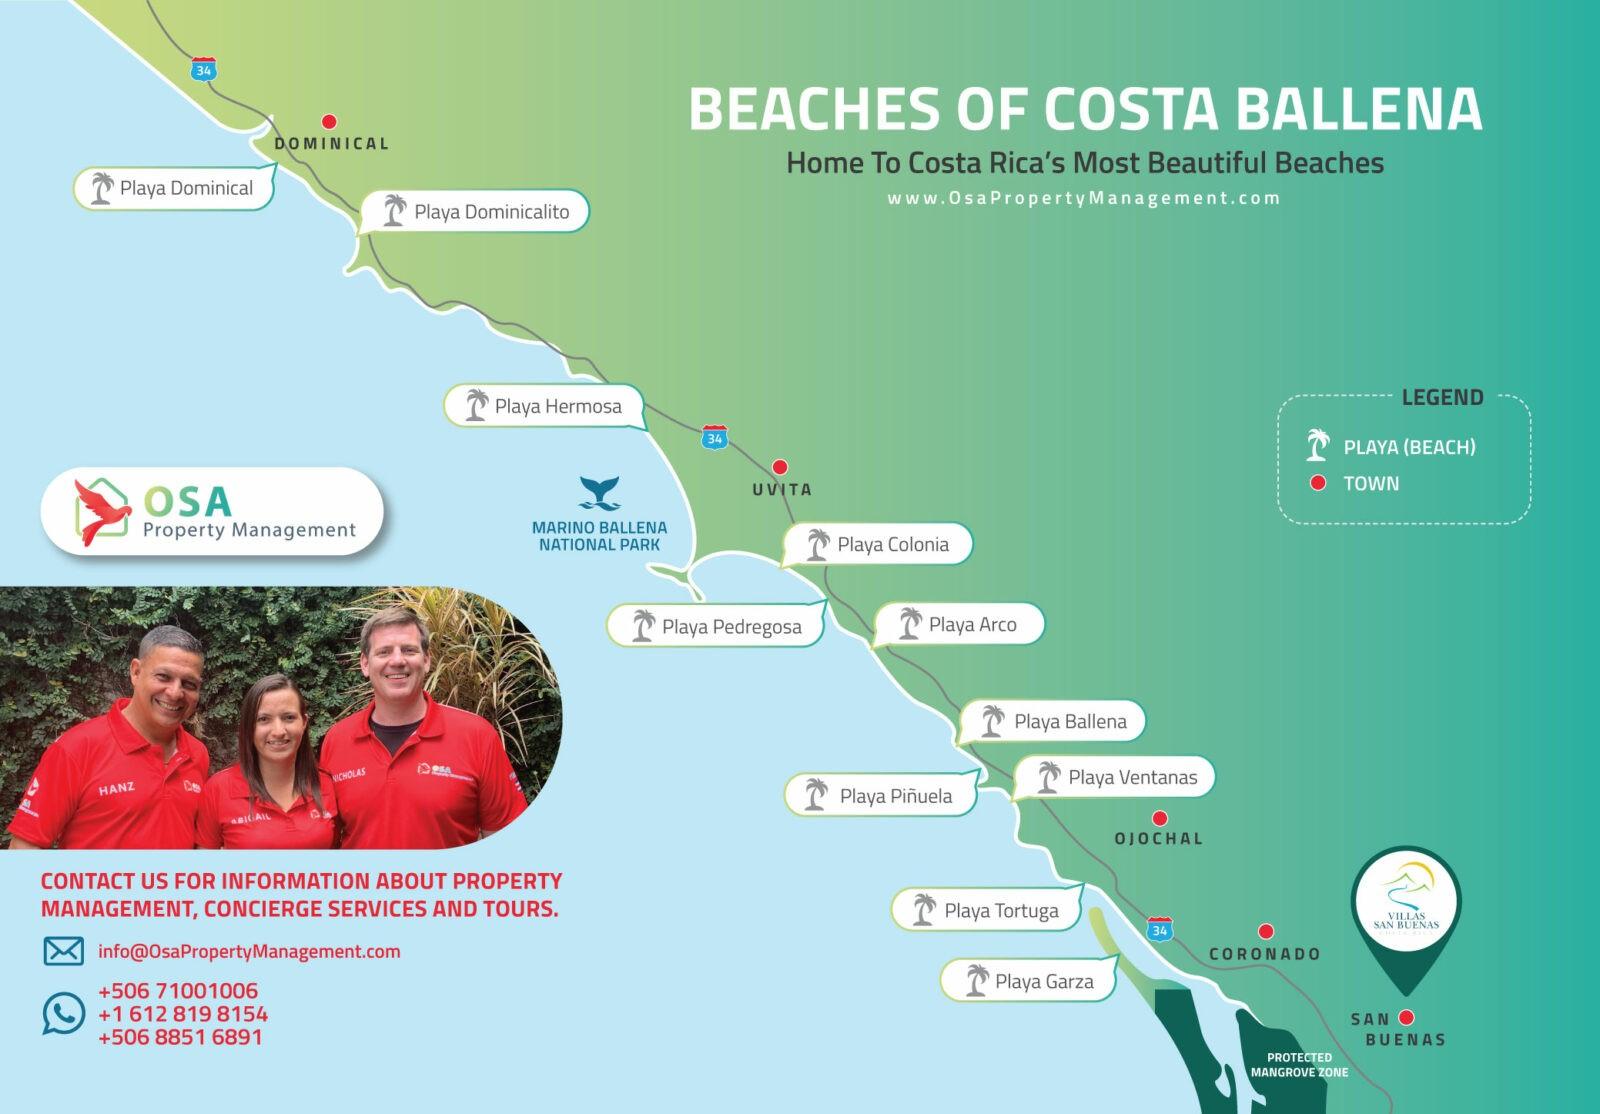 Beaches of Costa Ballena